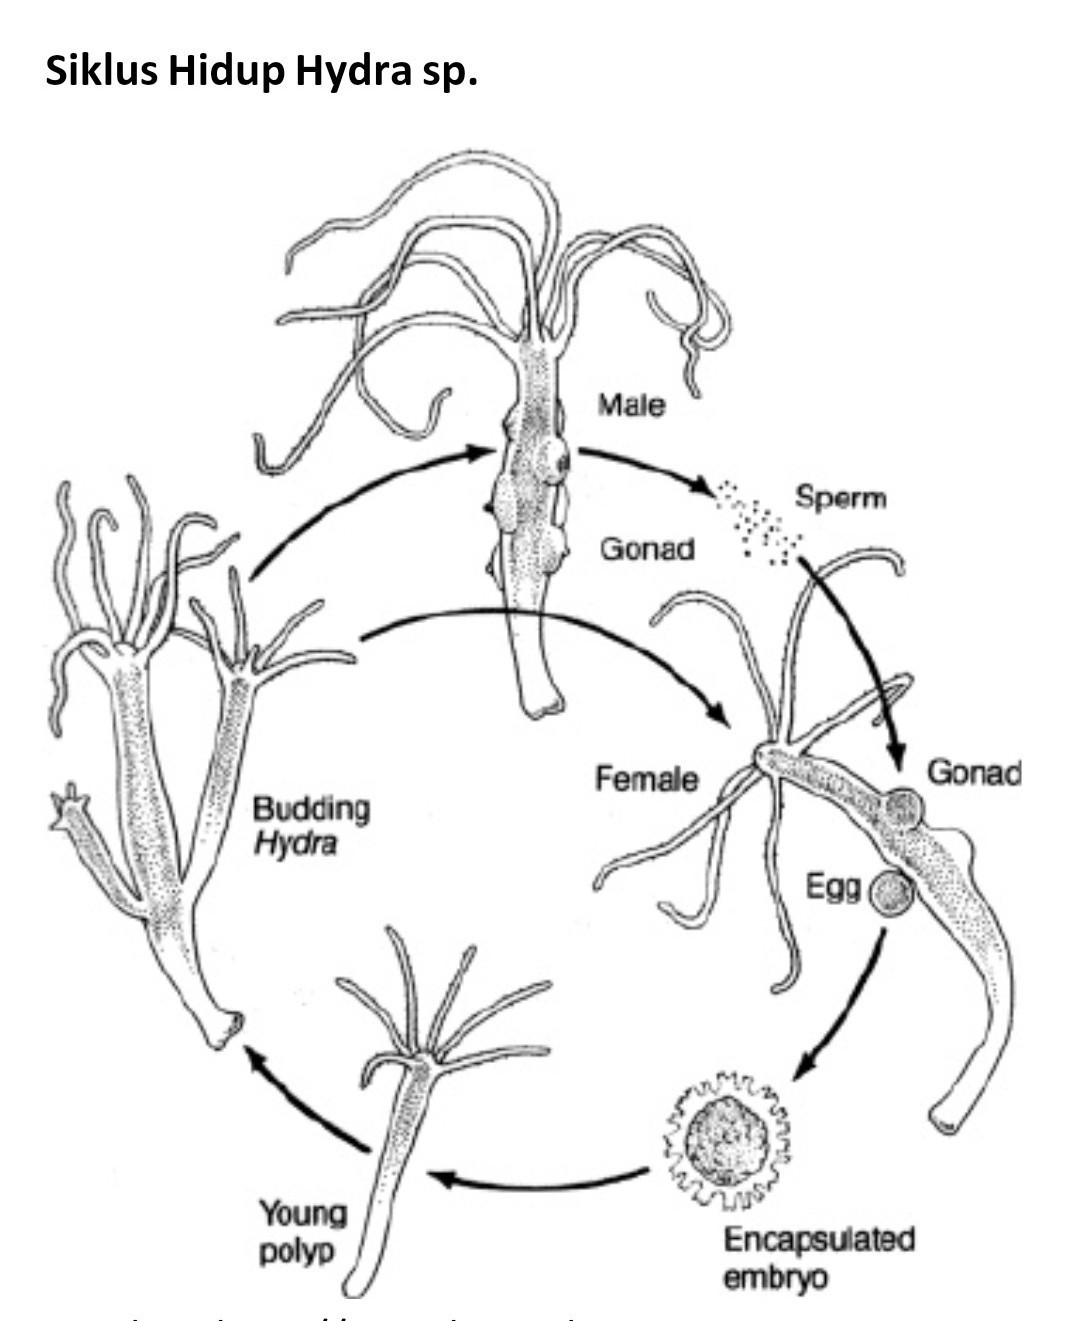 siklus hidup hydra sp